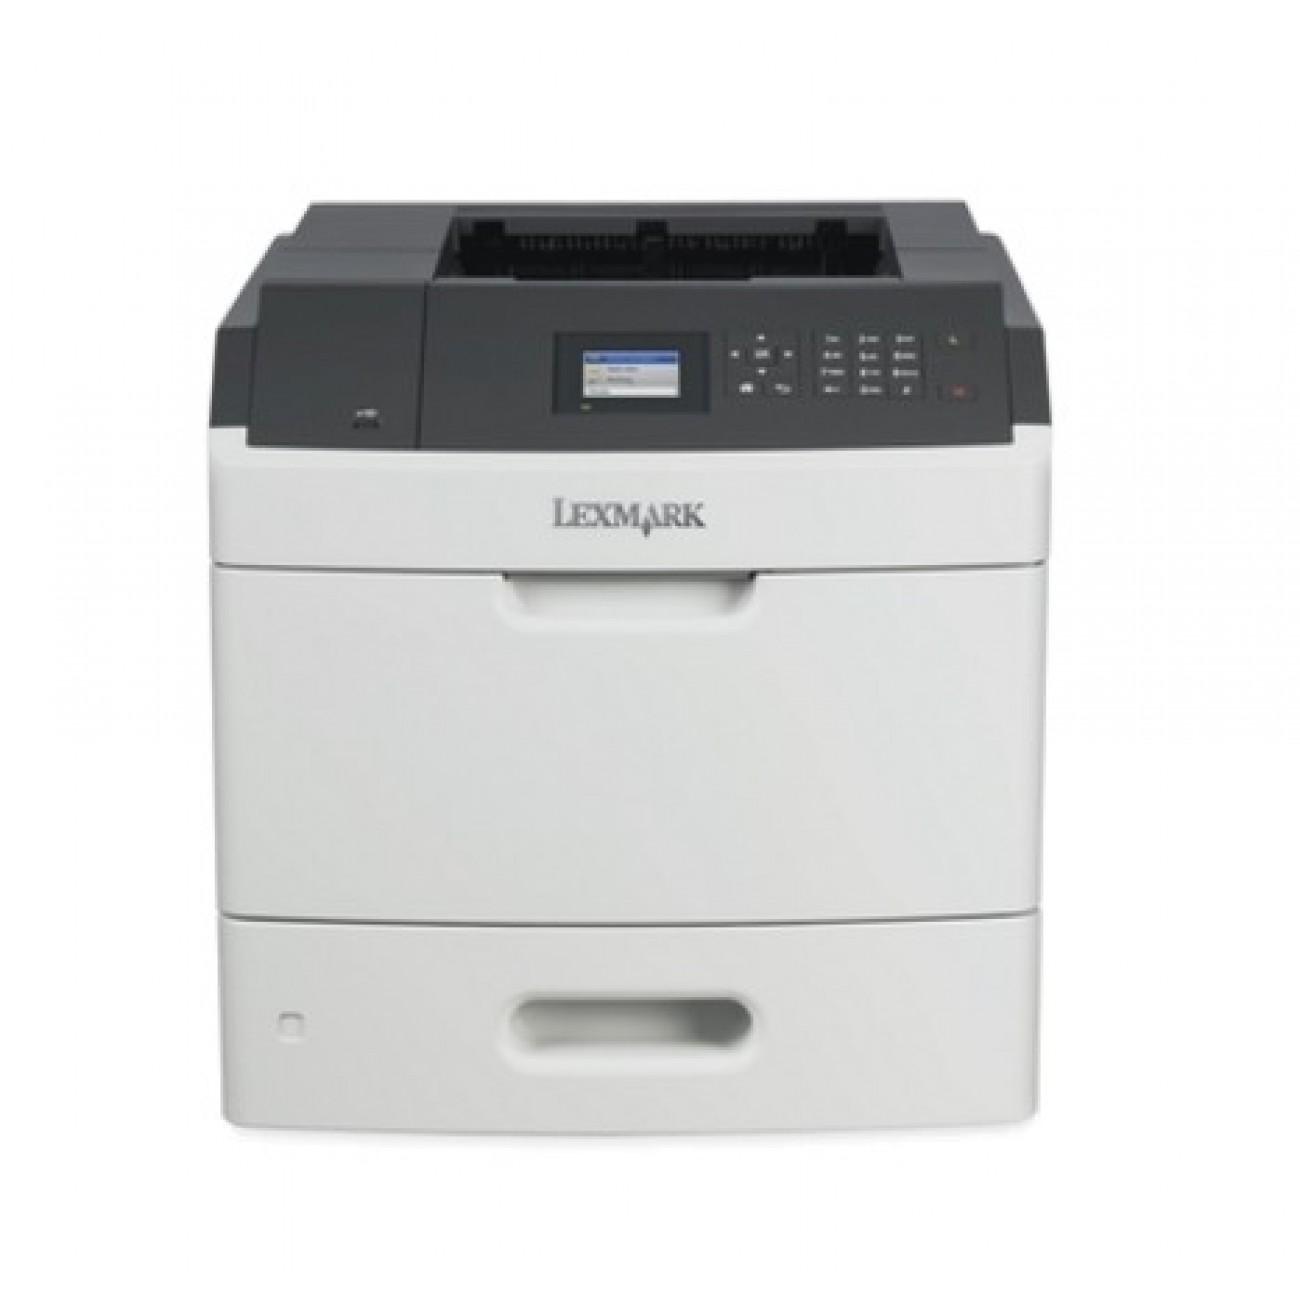 Лазерен принтер Lexmark MS817dn, монохромен, 1200 x 1200 dpi, До 52 стр/мин, LAN1000, USB, А4 в Принтери -  | Alleop